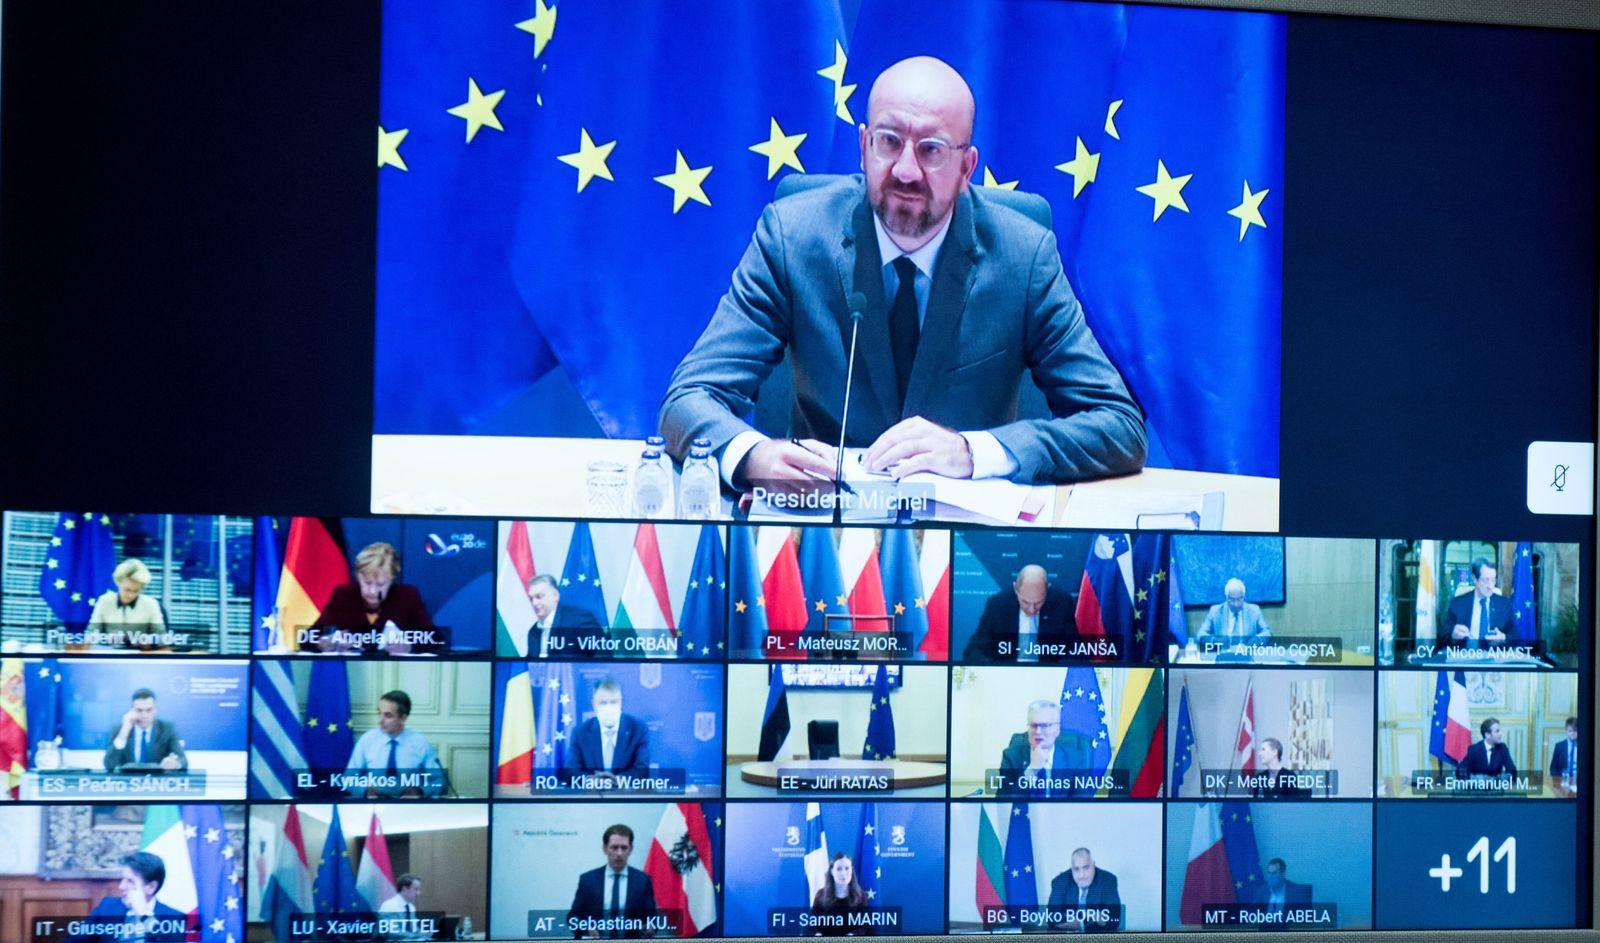 (201120) -- BRUSSELS, Nov. 20, 2020 -- Photo taken on Nov. 19, 2020 in Brussels, Belgium shows top (EU) officials attend